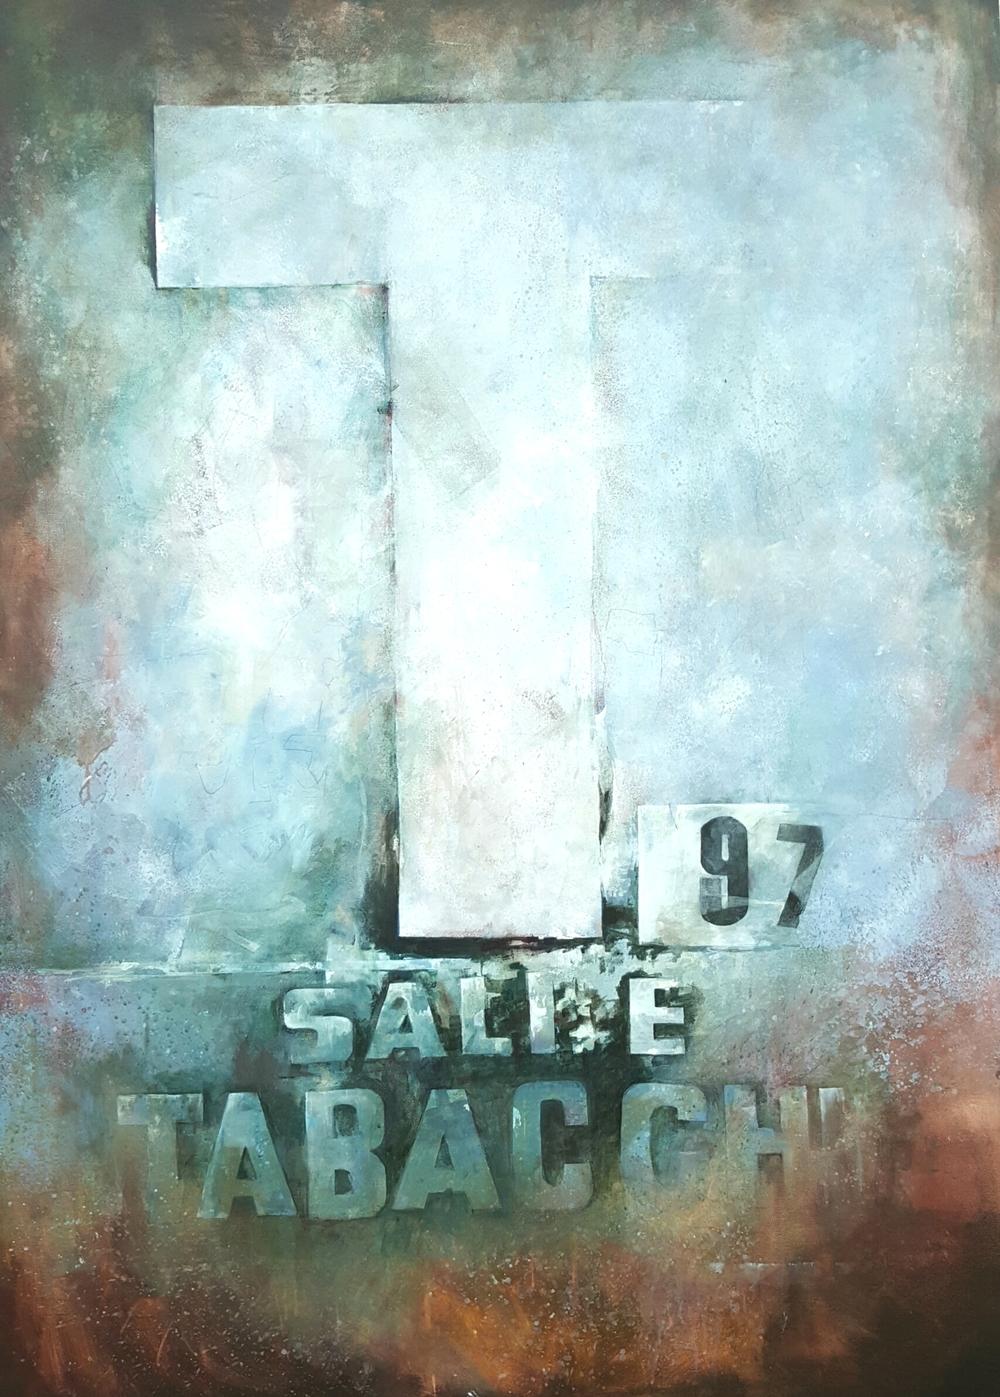 Sali e Tabbachi 97